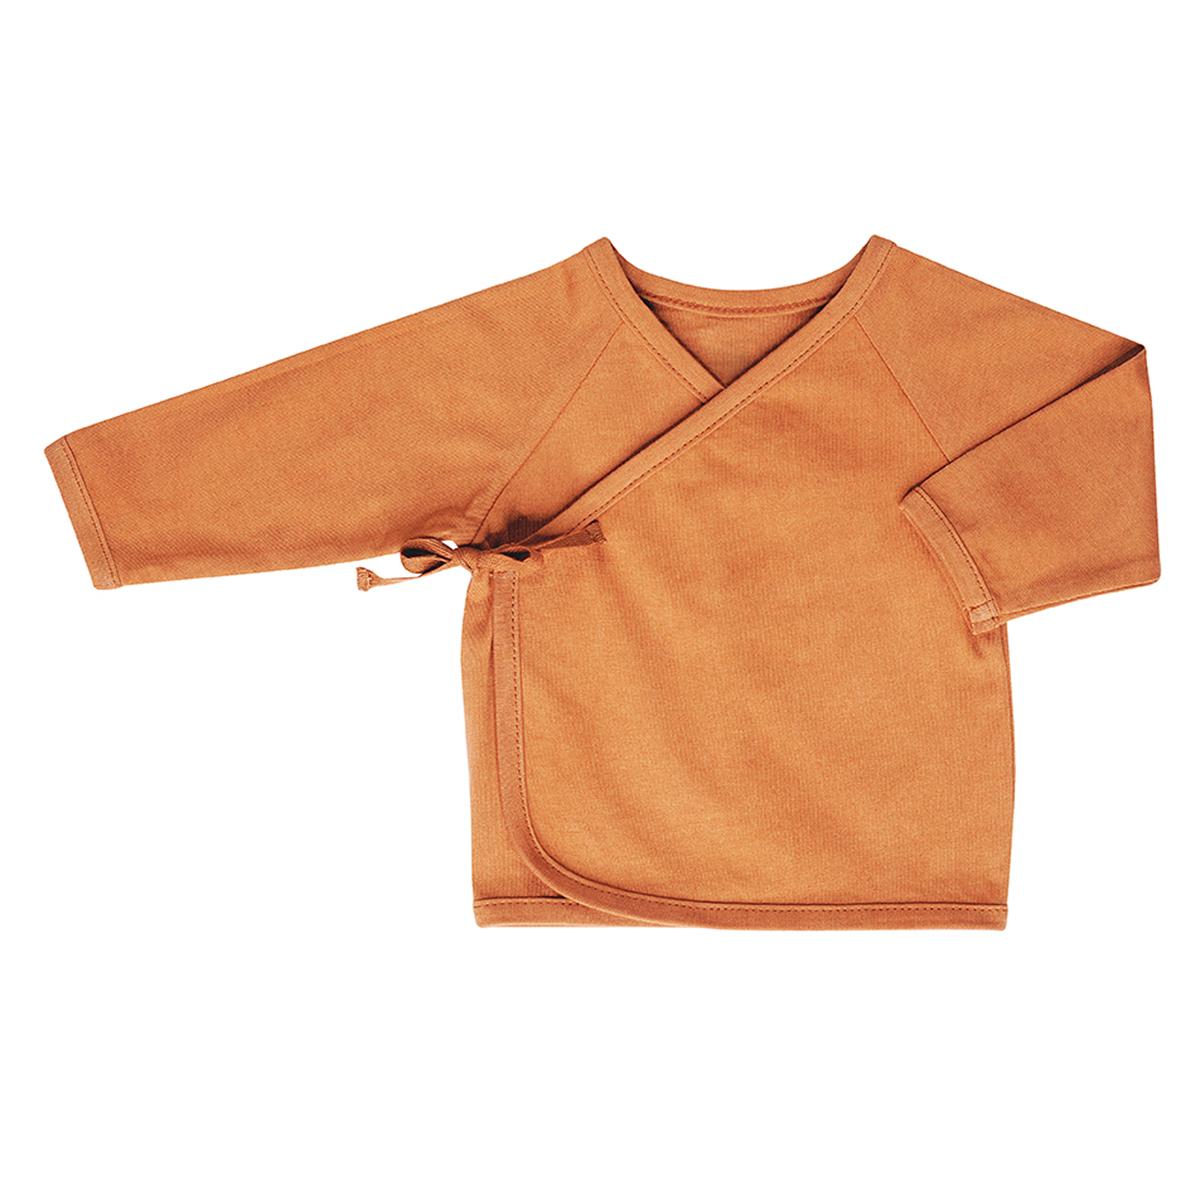 Haut bébé Cardigan Kimono Nut - 1 Mois Cardigan Kimono Nut - 1 Mois